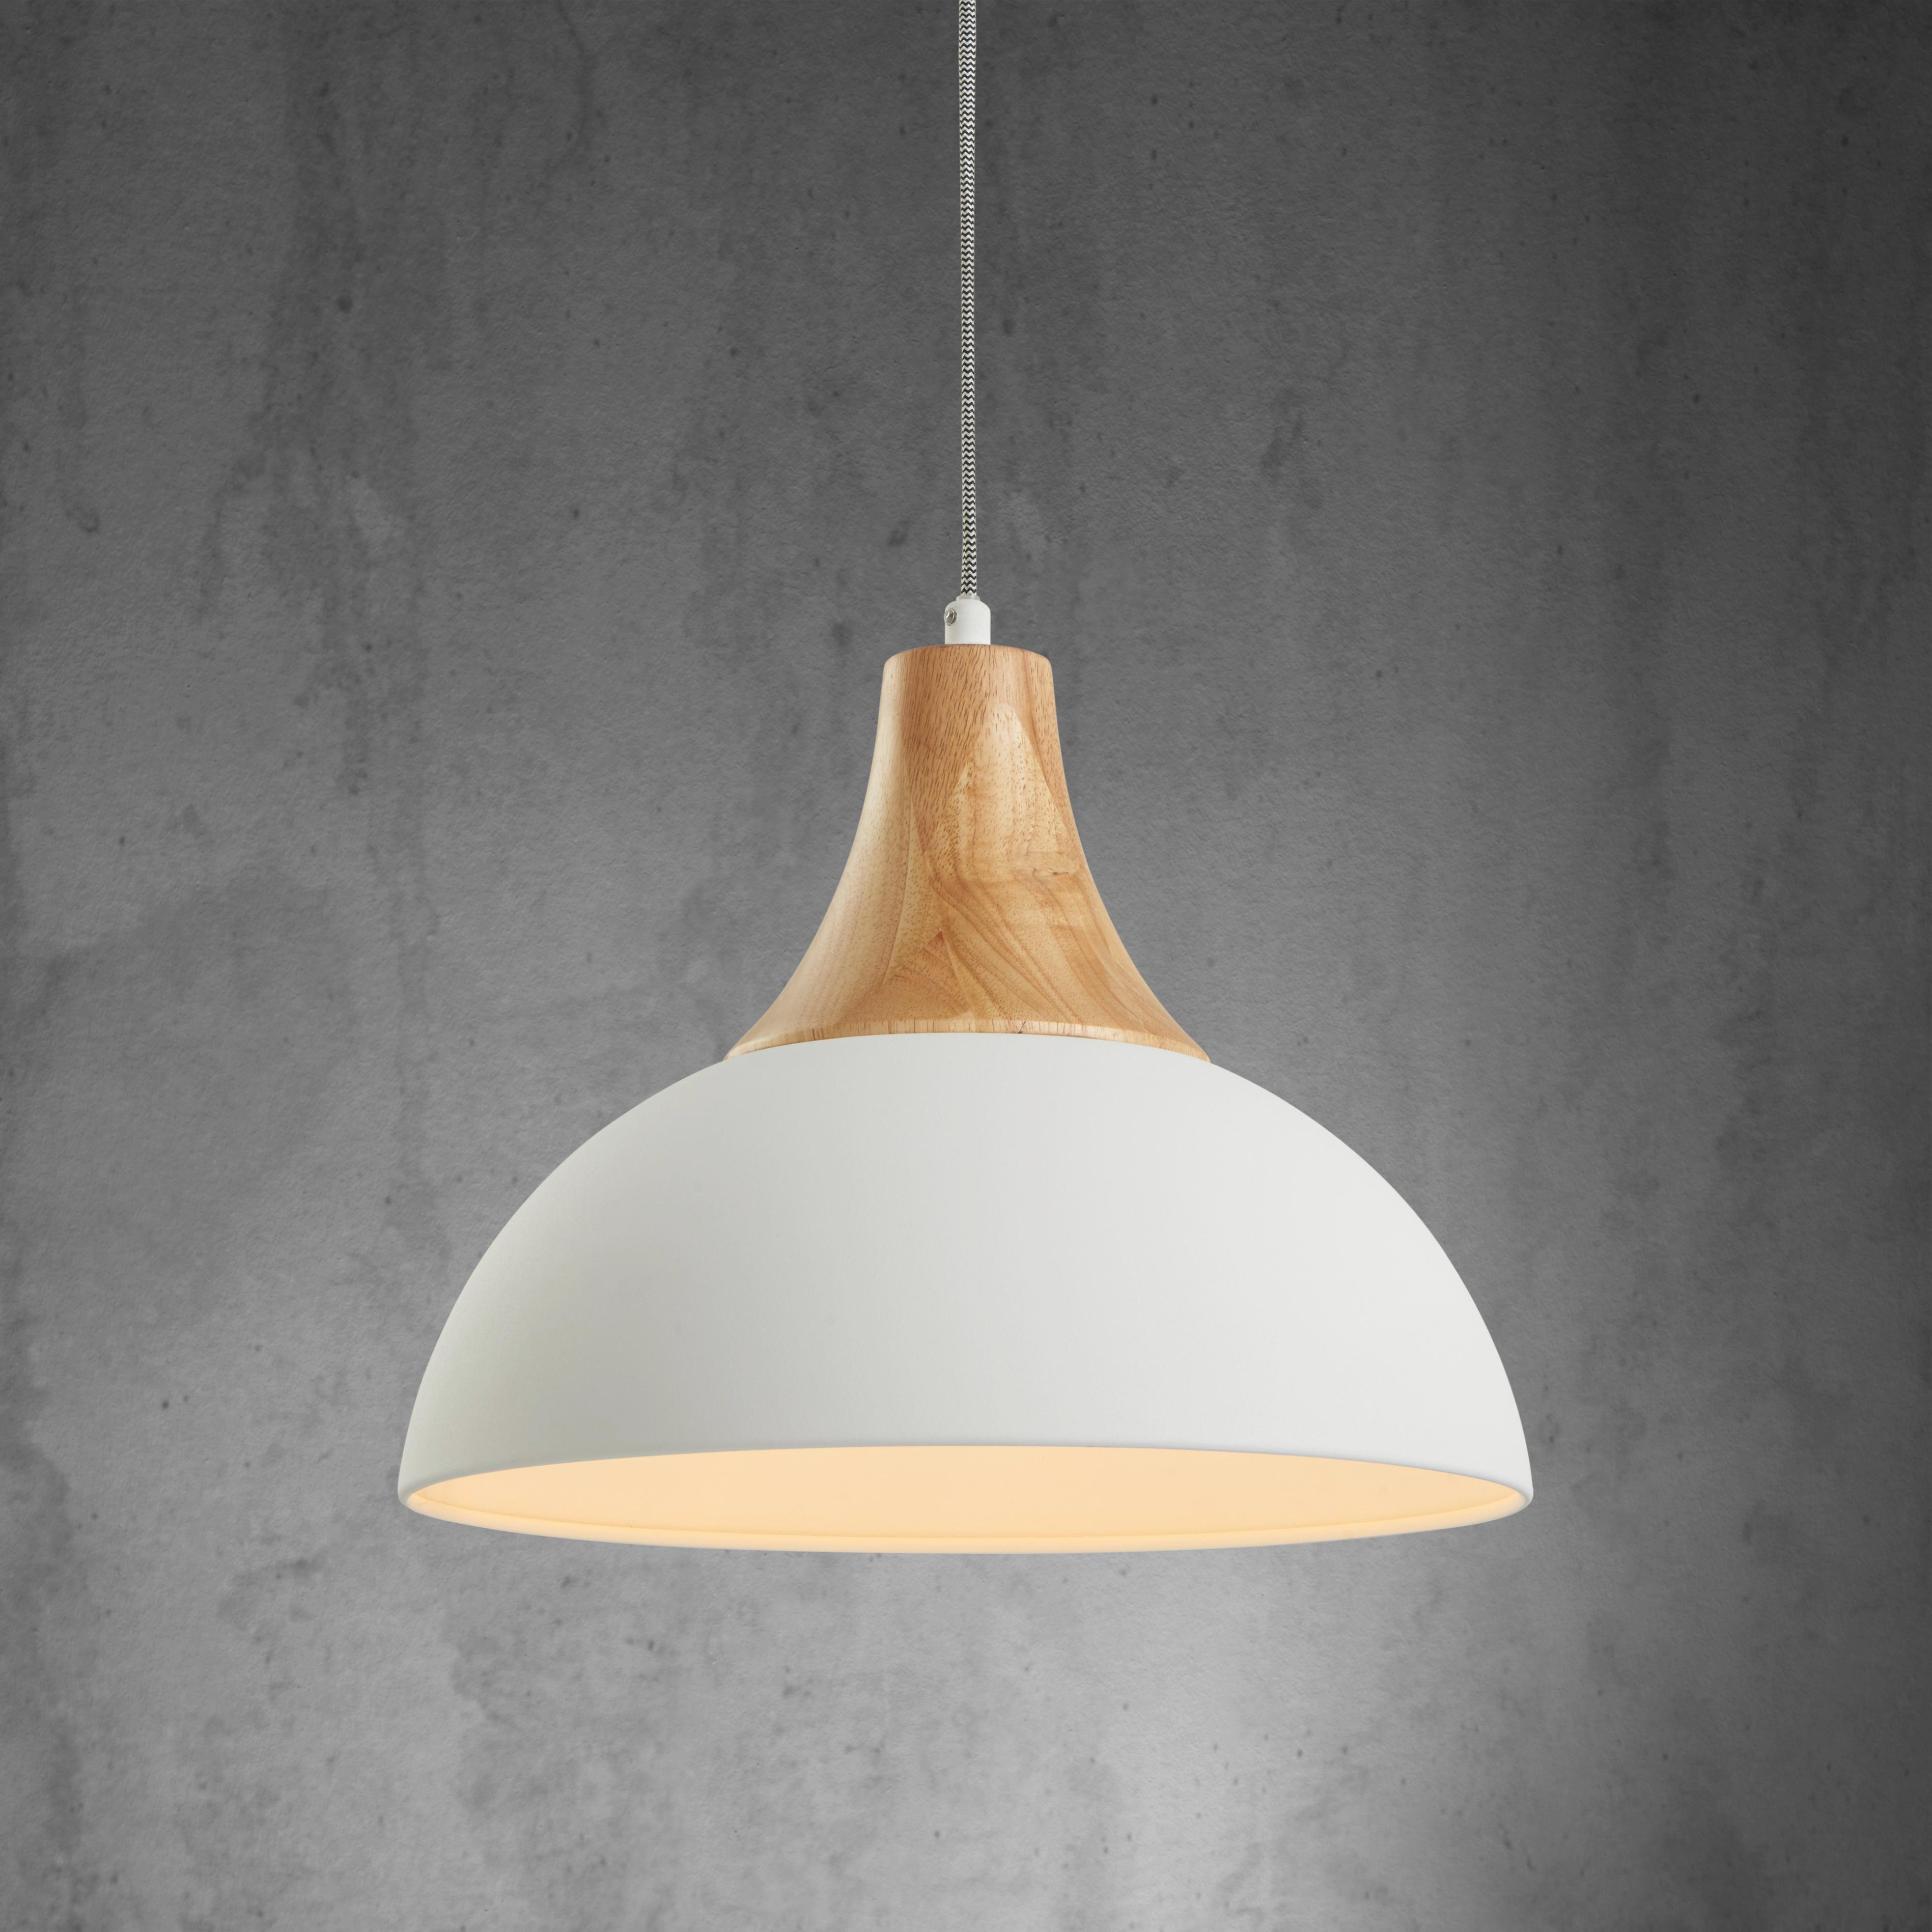 Hängeleuchte Fiona - Weiß, MODERN, Holz/Metall (37,5/120cm) - MÖMAX modern living